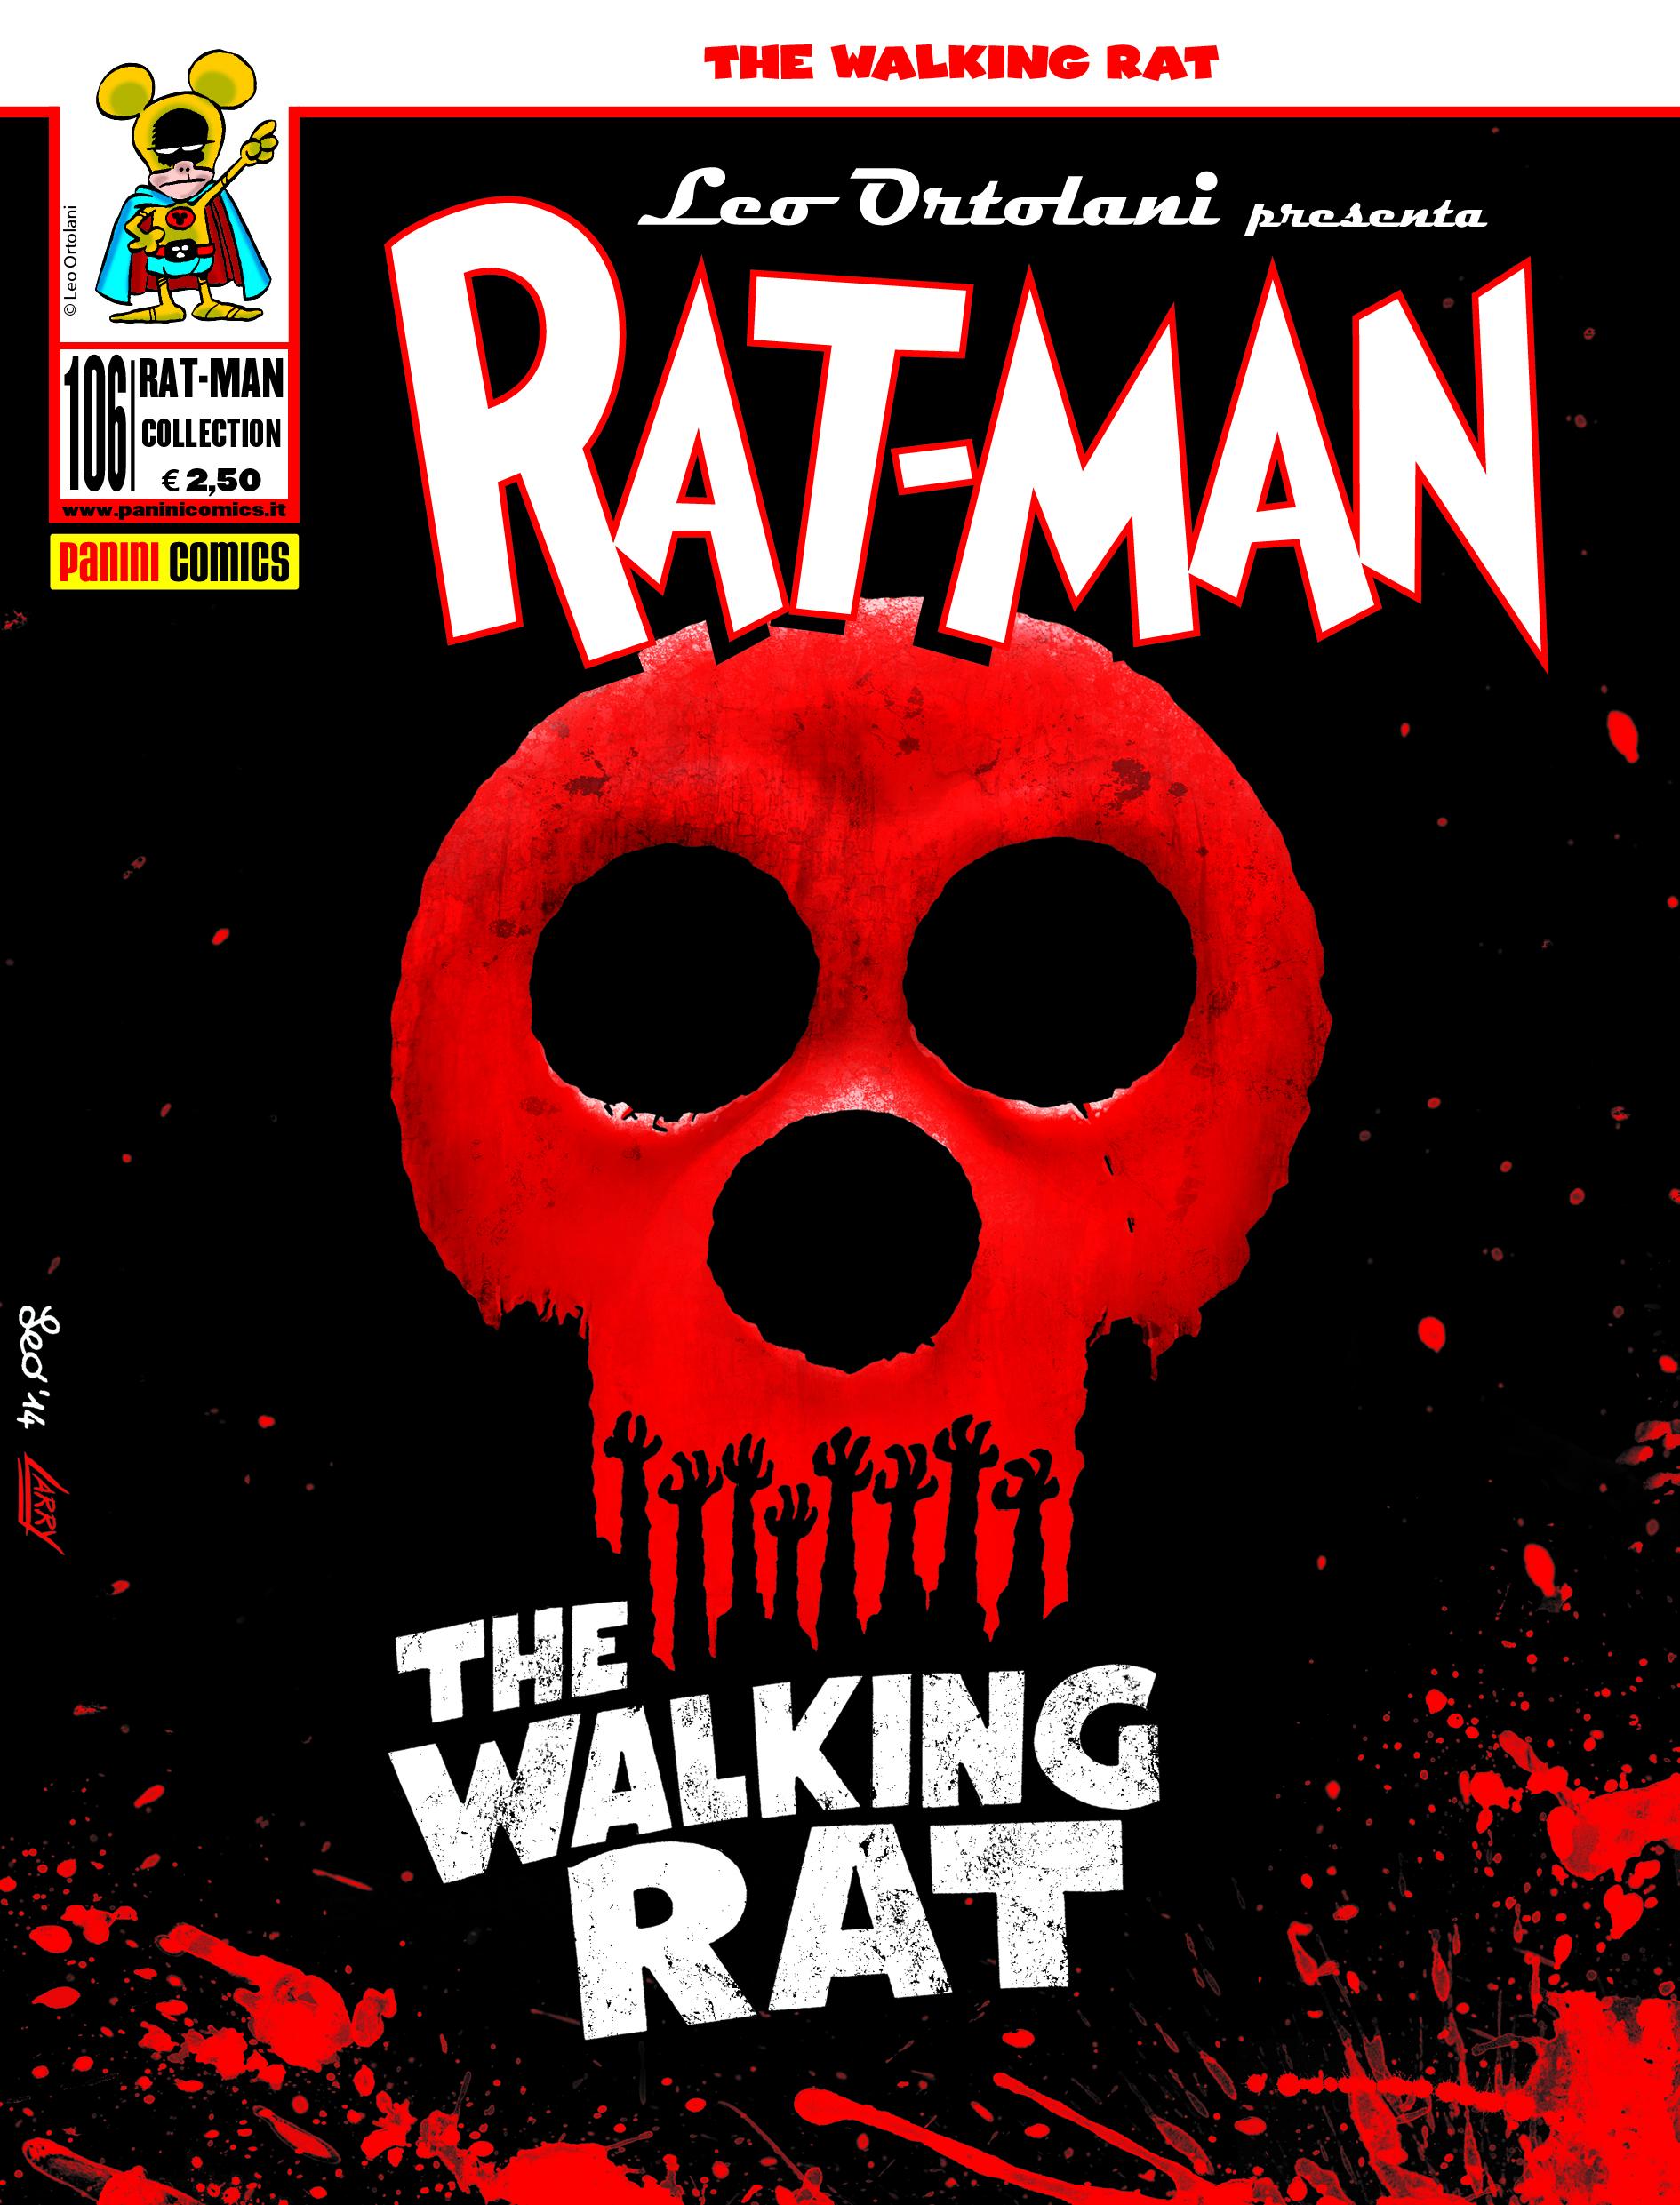 The Walking Rat - Leo Ortolani